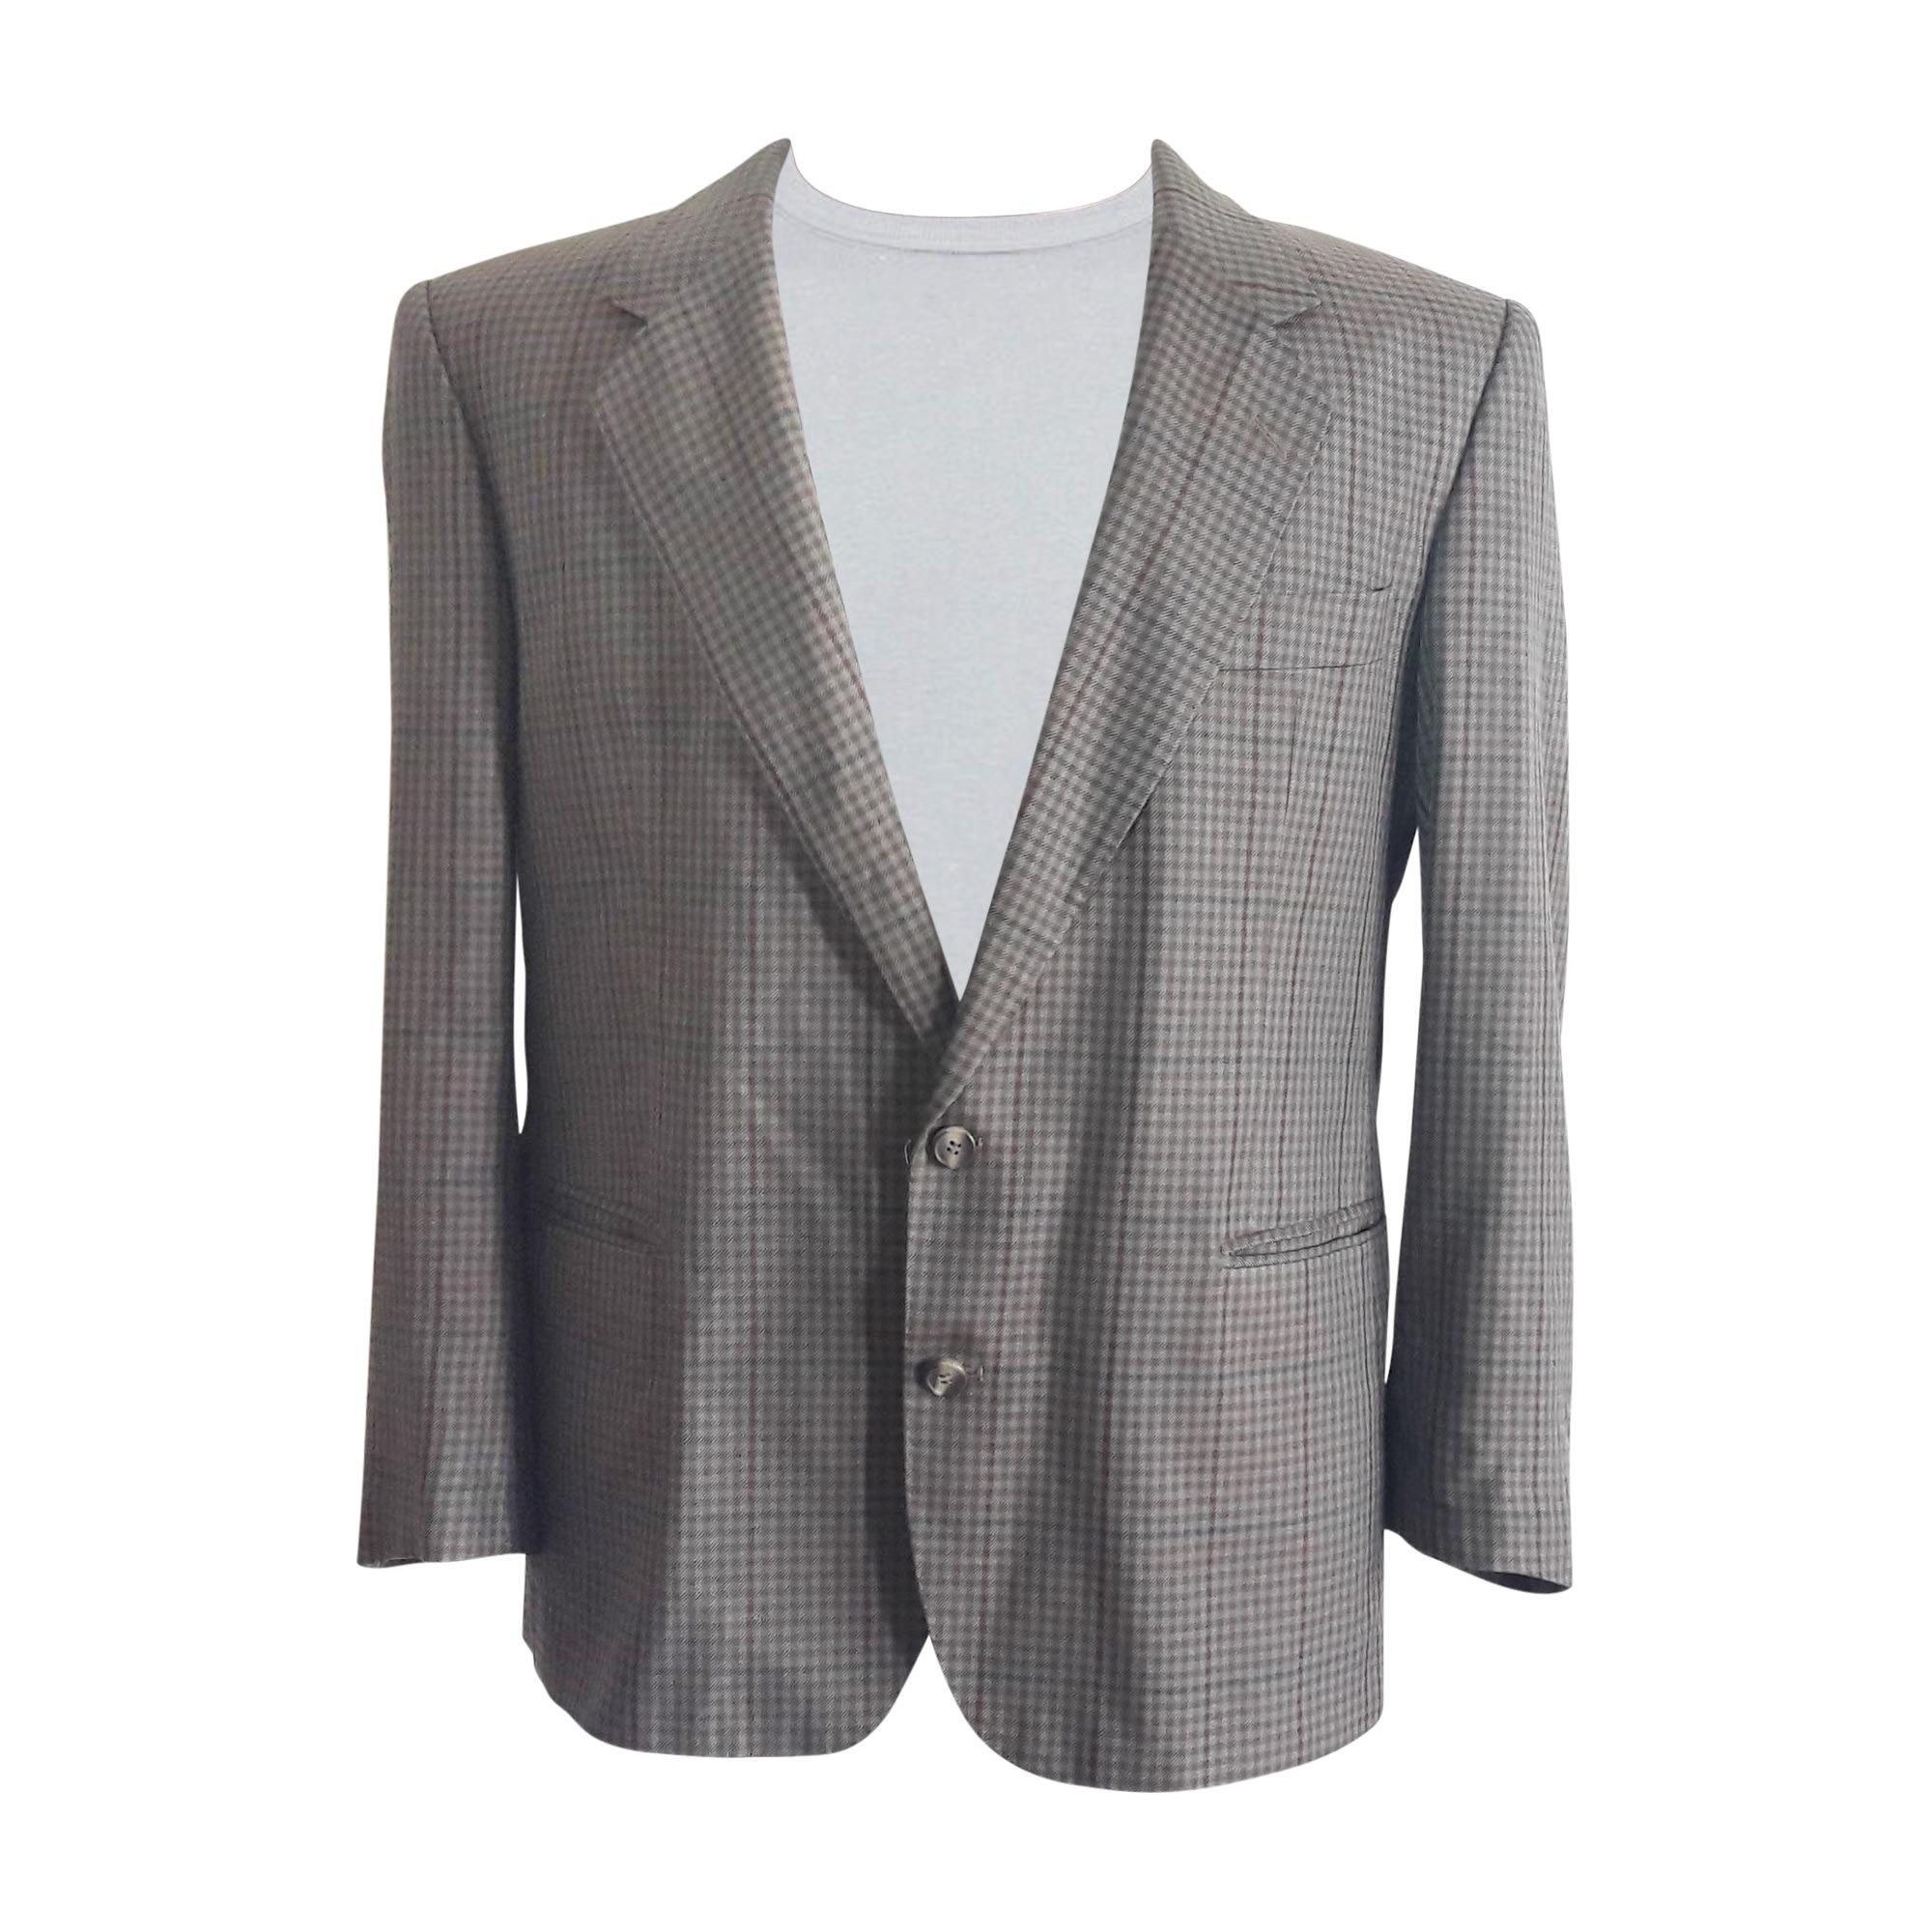 Suit Jacket DIOR Brown